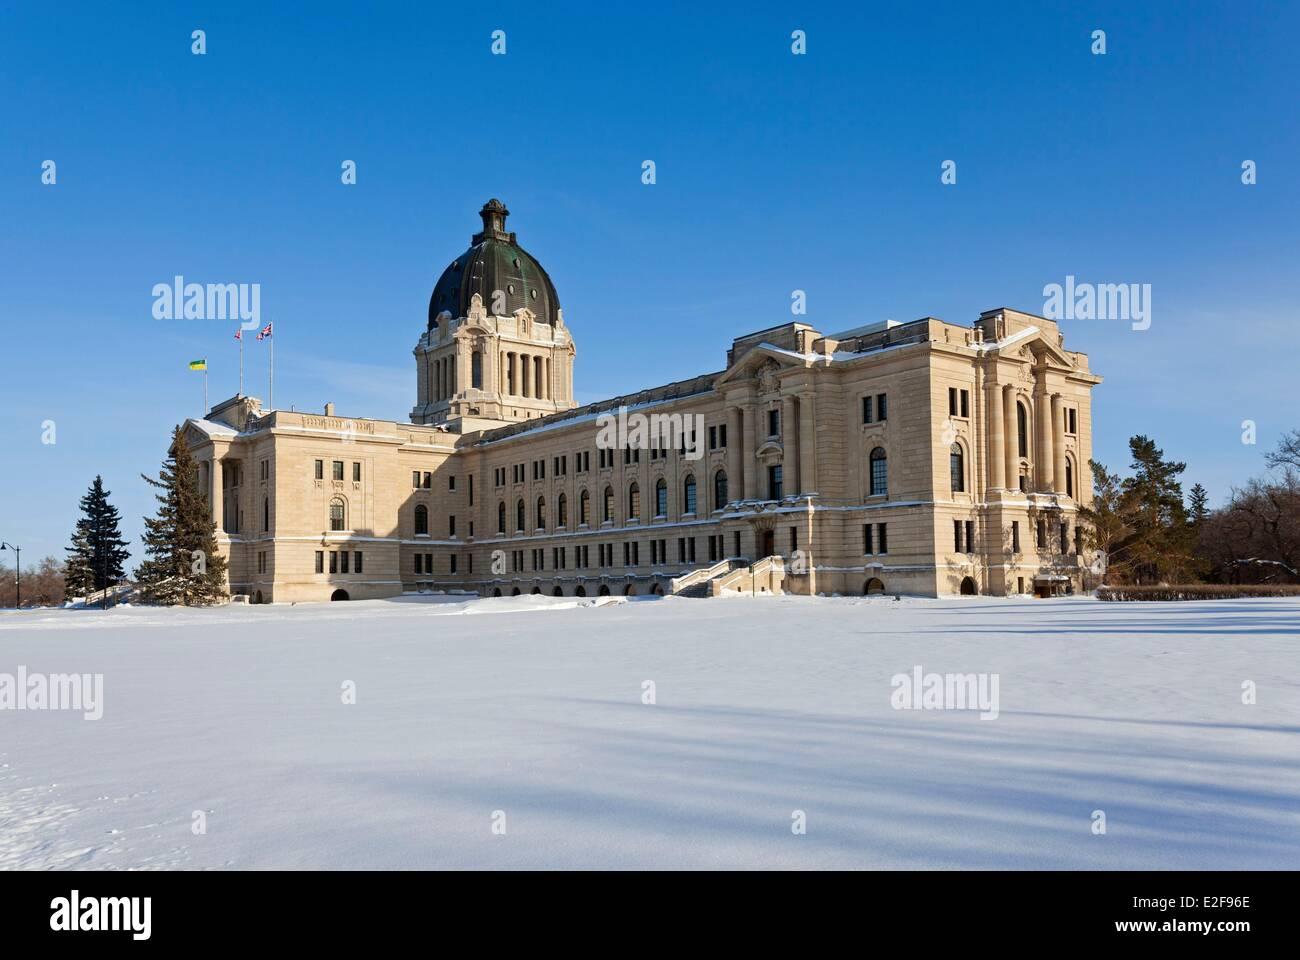 Canada, Saskatchewan, Regina, the provincial capital, the parliament - Stock Image